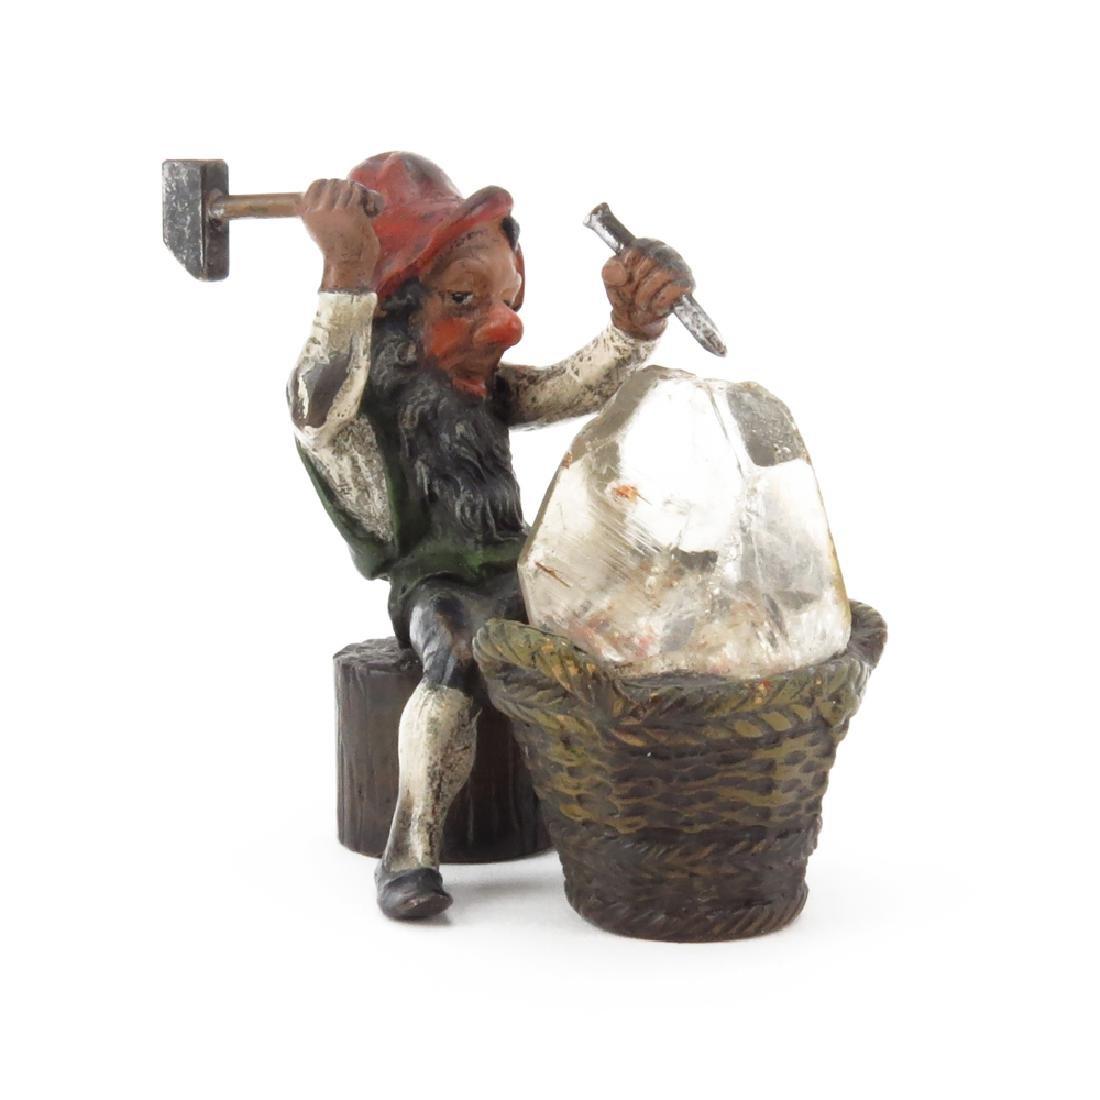 Antique Bergmann Cold Painted Vienna Bronze Gnome